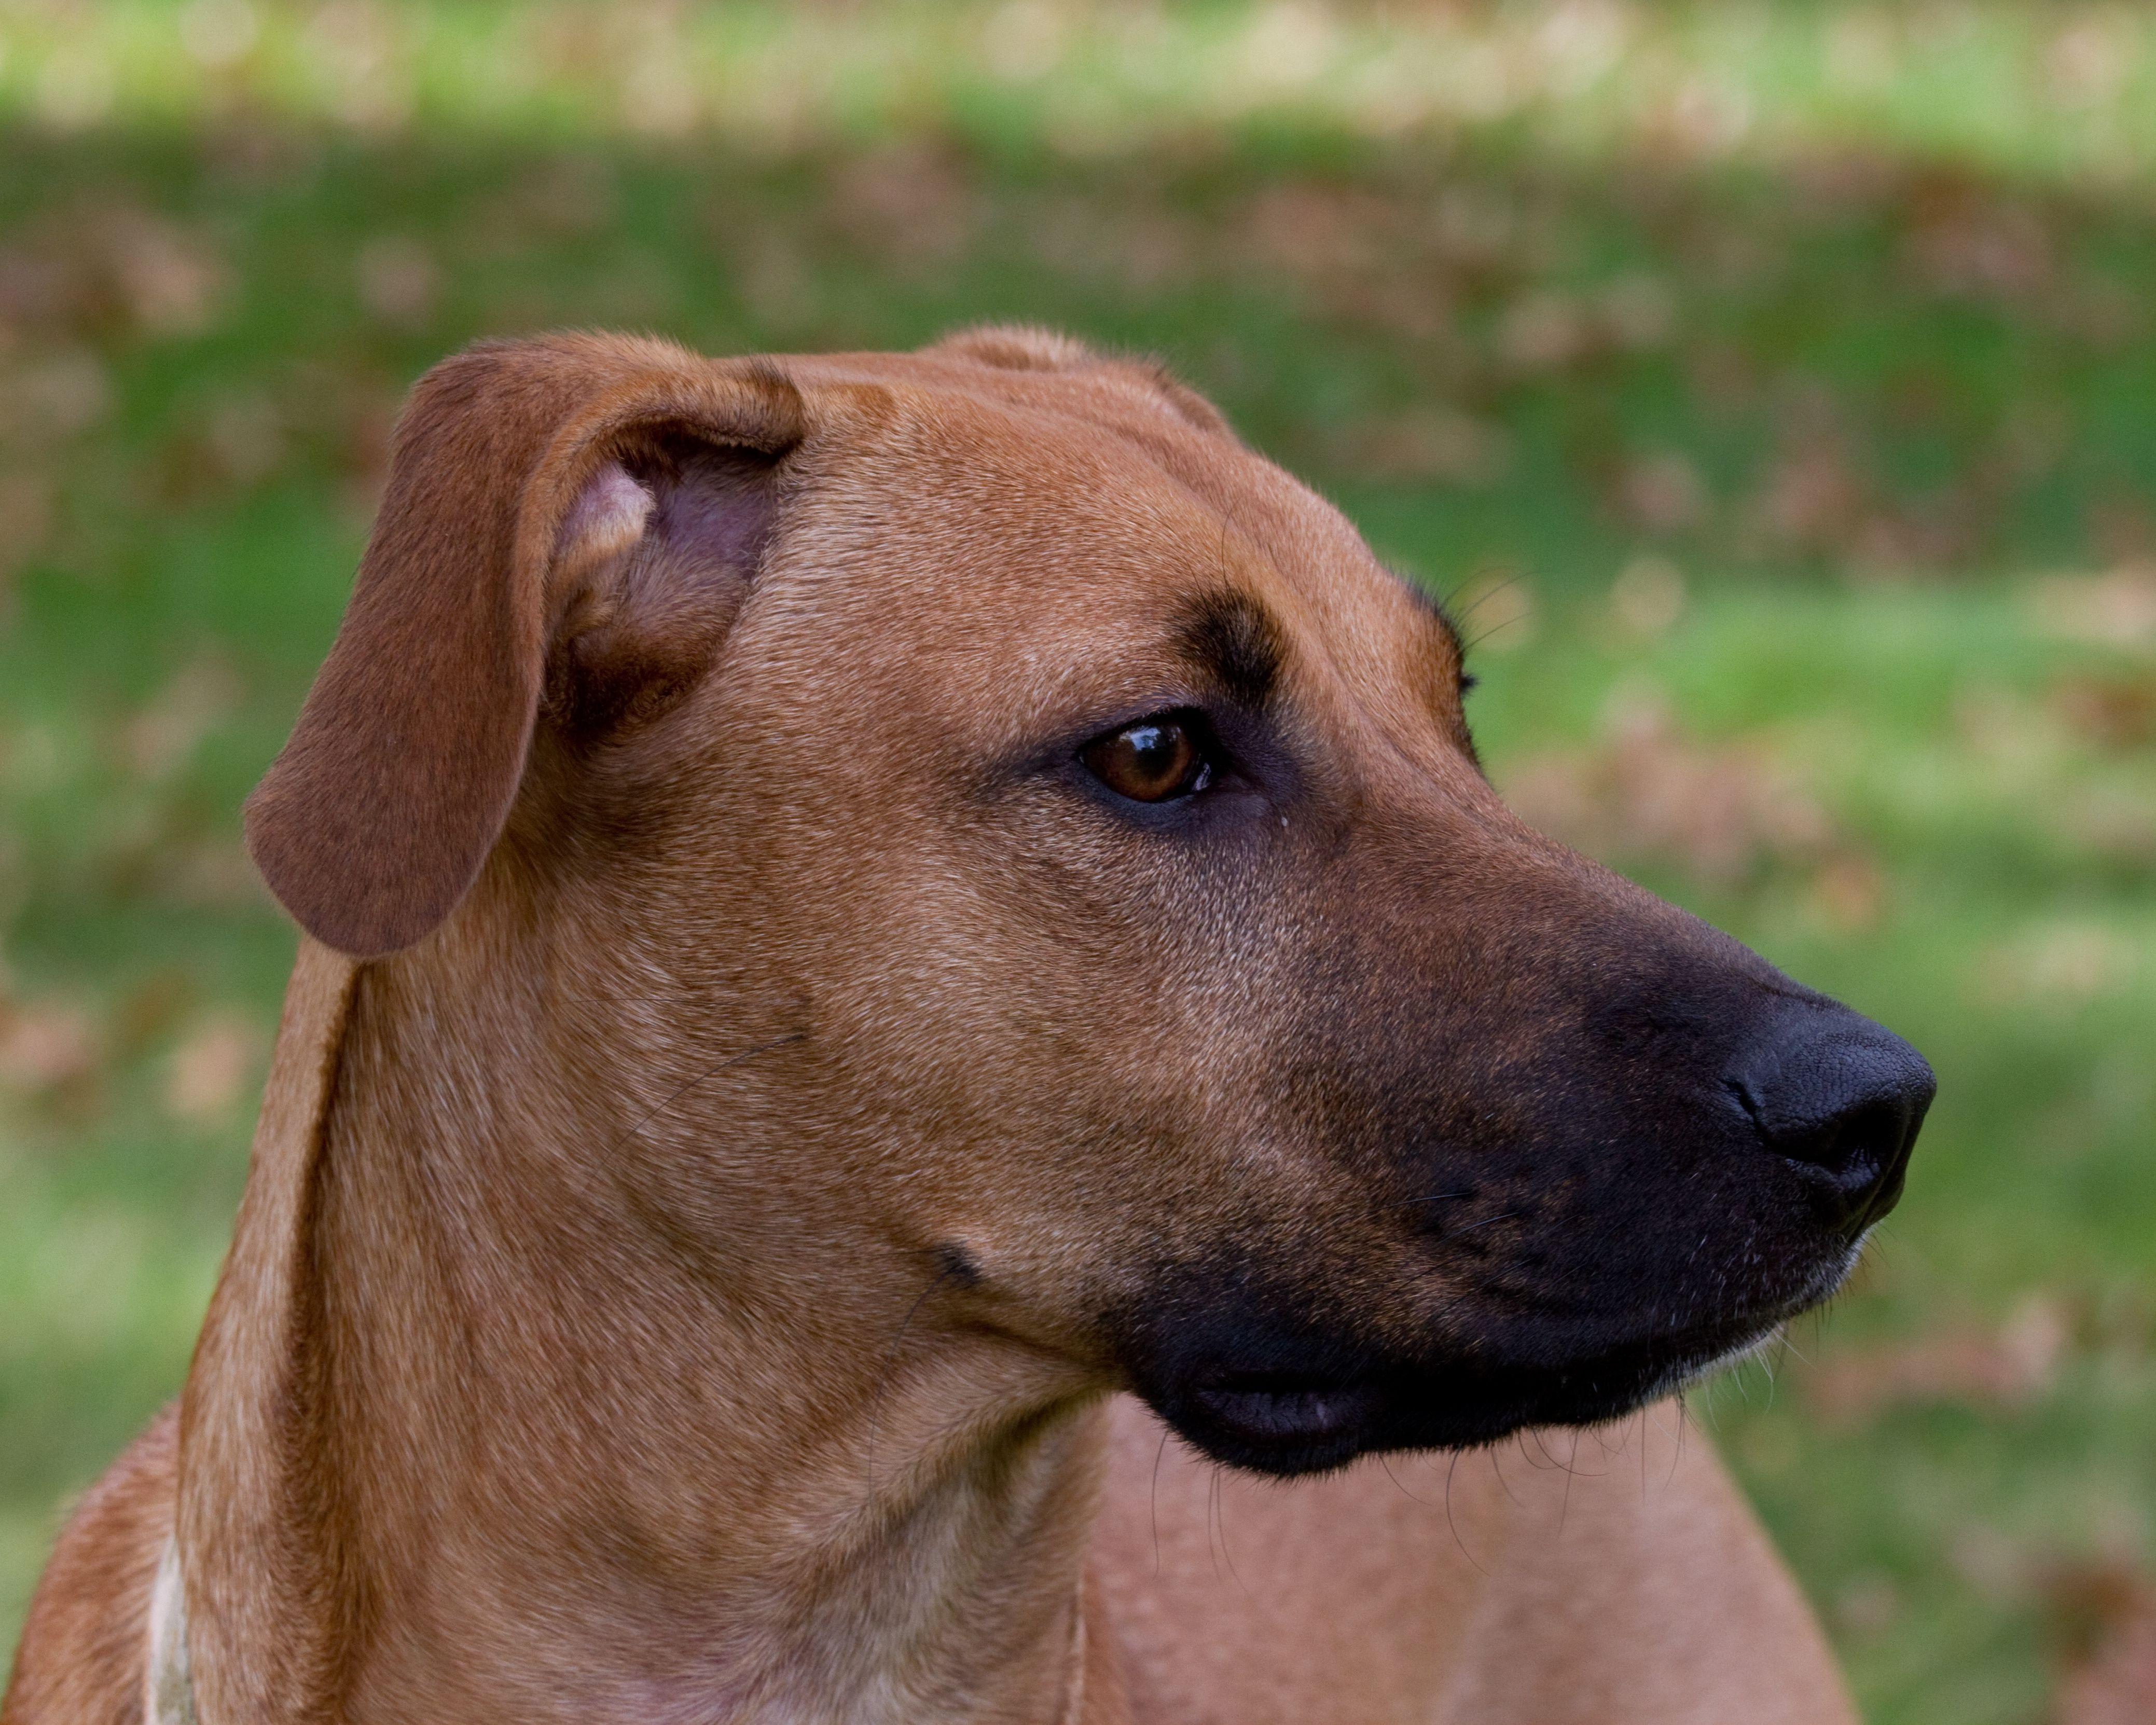 Must see Mouth Cur Black Adorable Dog - 88ebe722b59fbe656a3da9215b76d89e  Trends_949617  .jpg